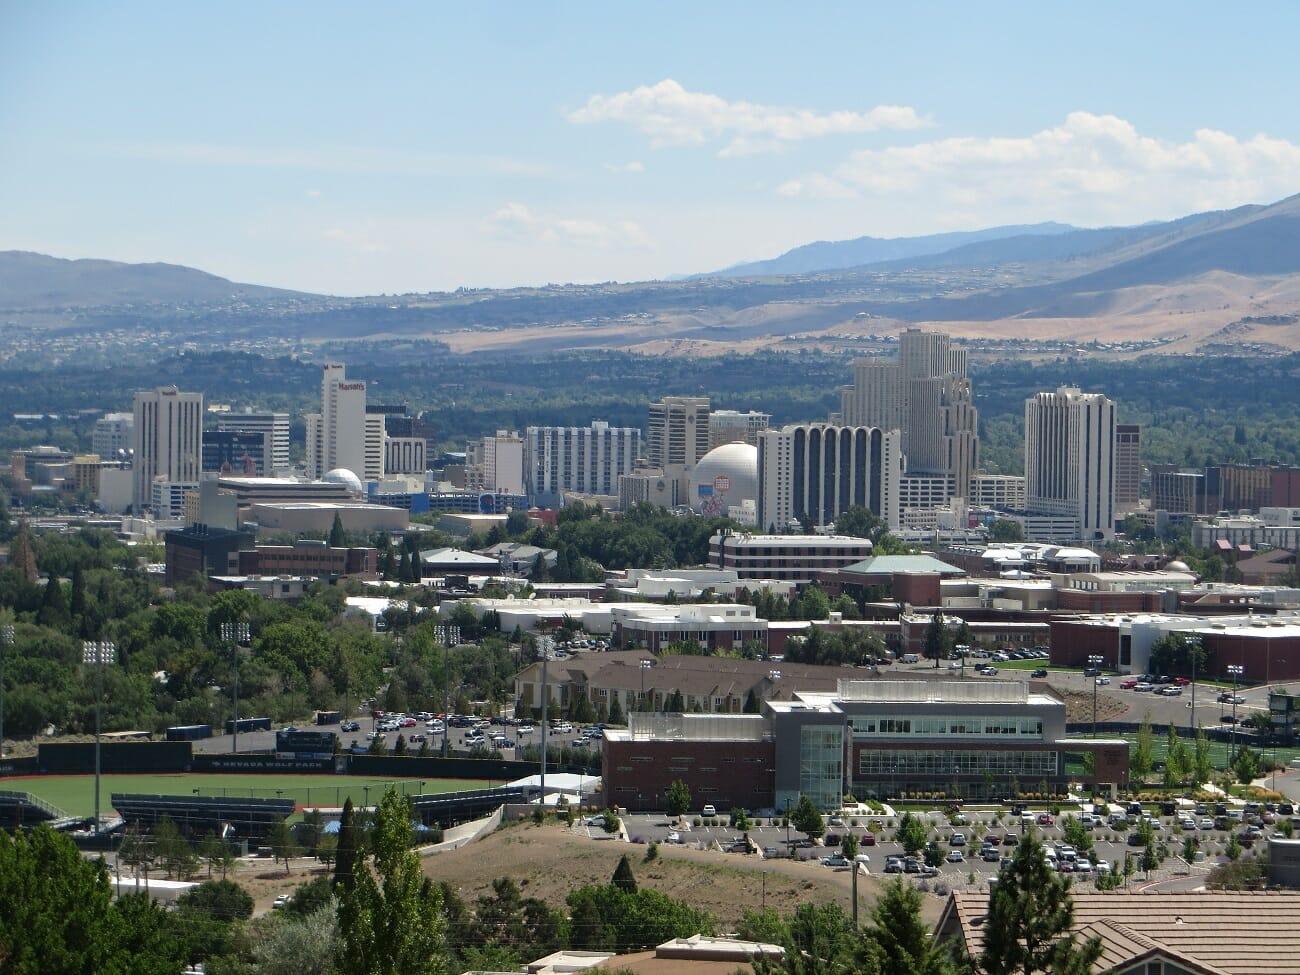 Reno, NV. Public domain photo via Wikimedia.